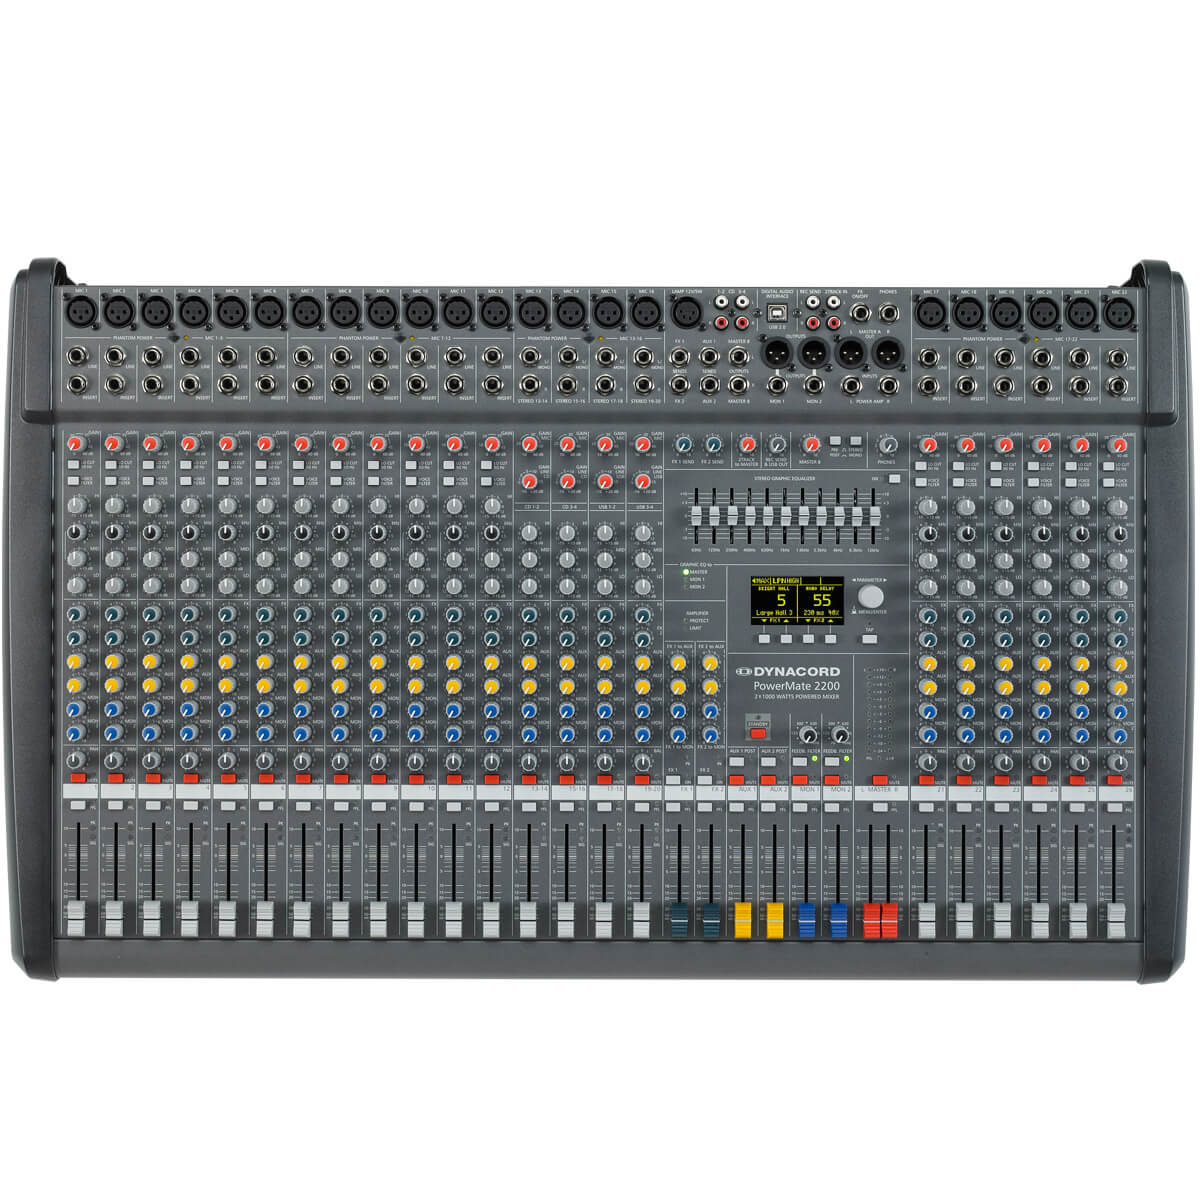 Mixer Dynacord PowerMate 2200-3 nhap khau